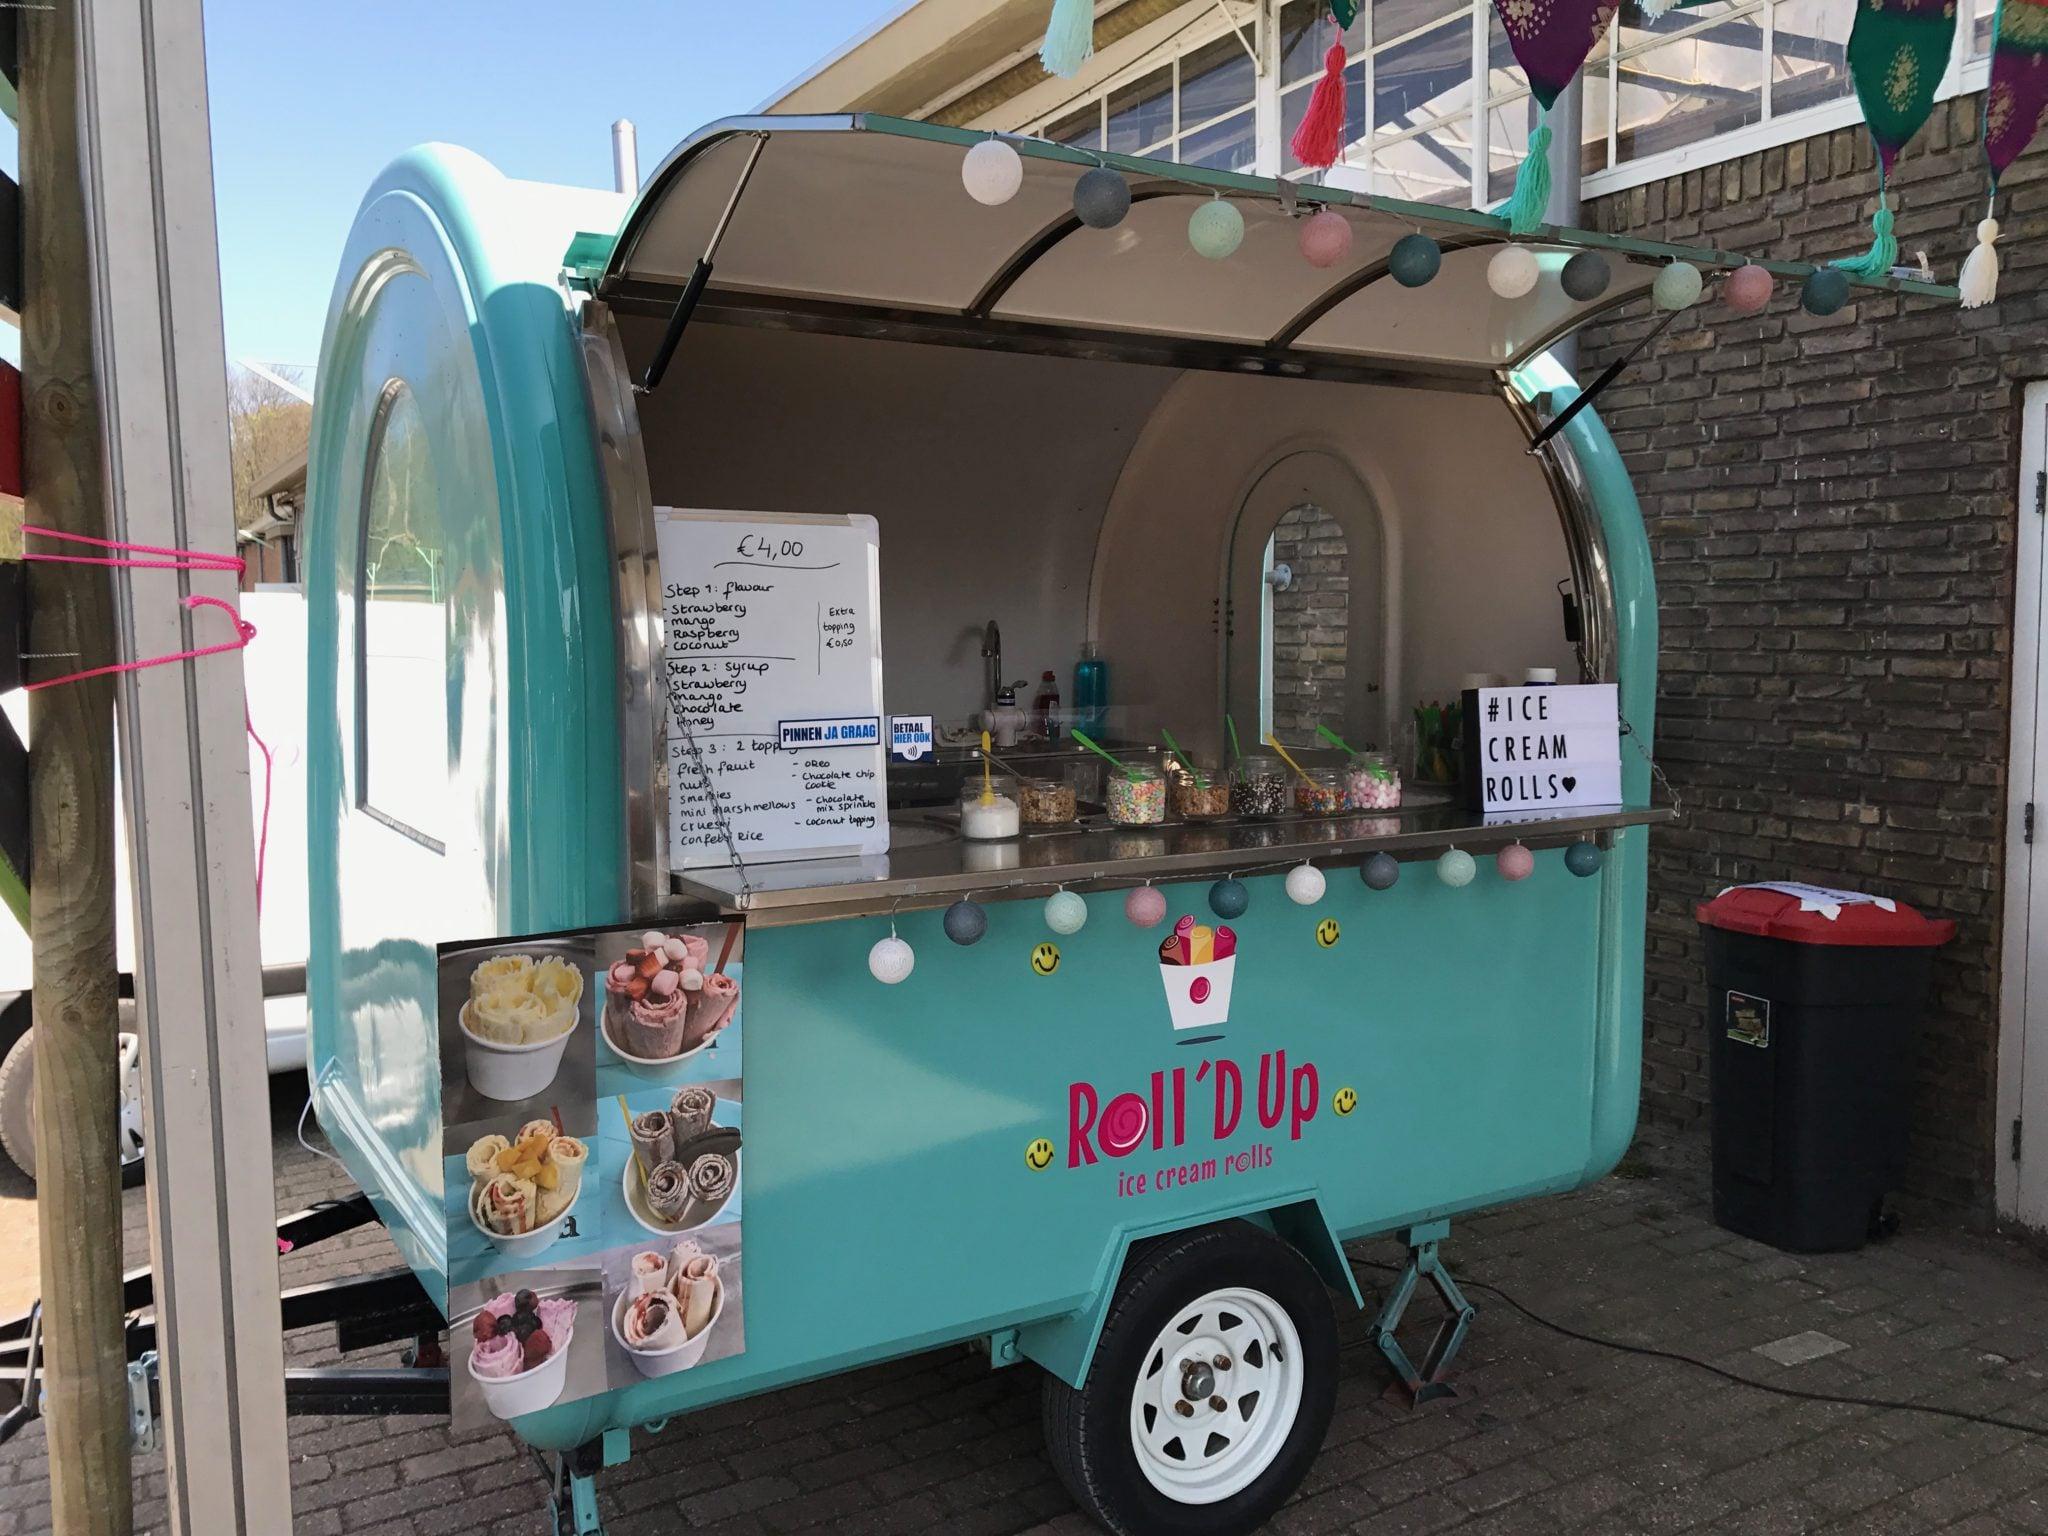 Icecream Rolls Foodtruck - Roll'd Up